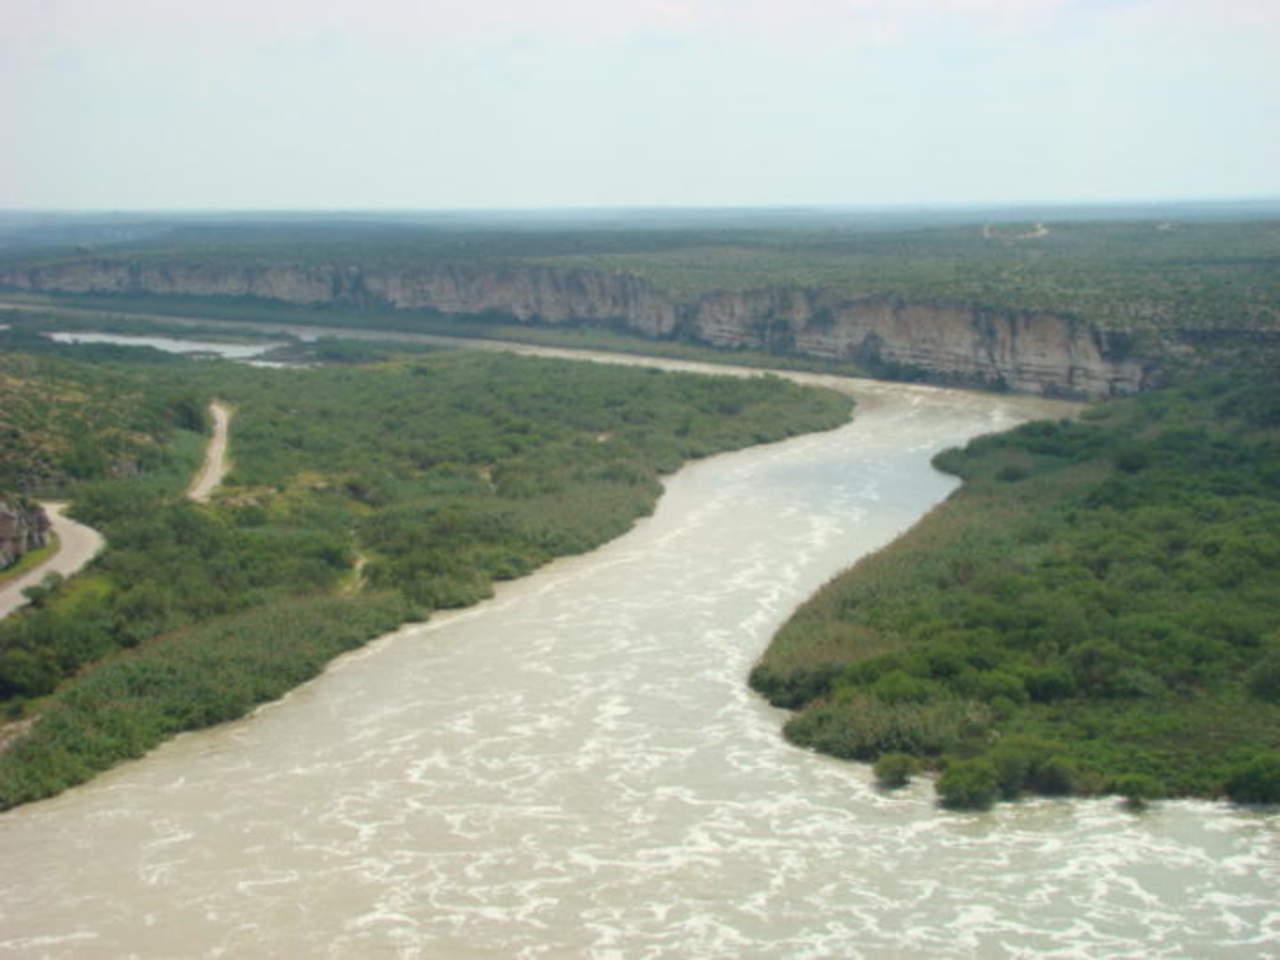 Busquen en las presas de Coahuila: capo detenido